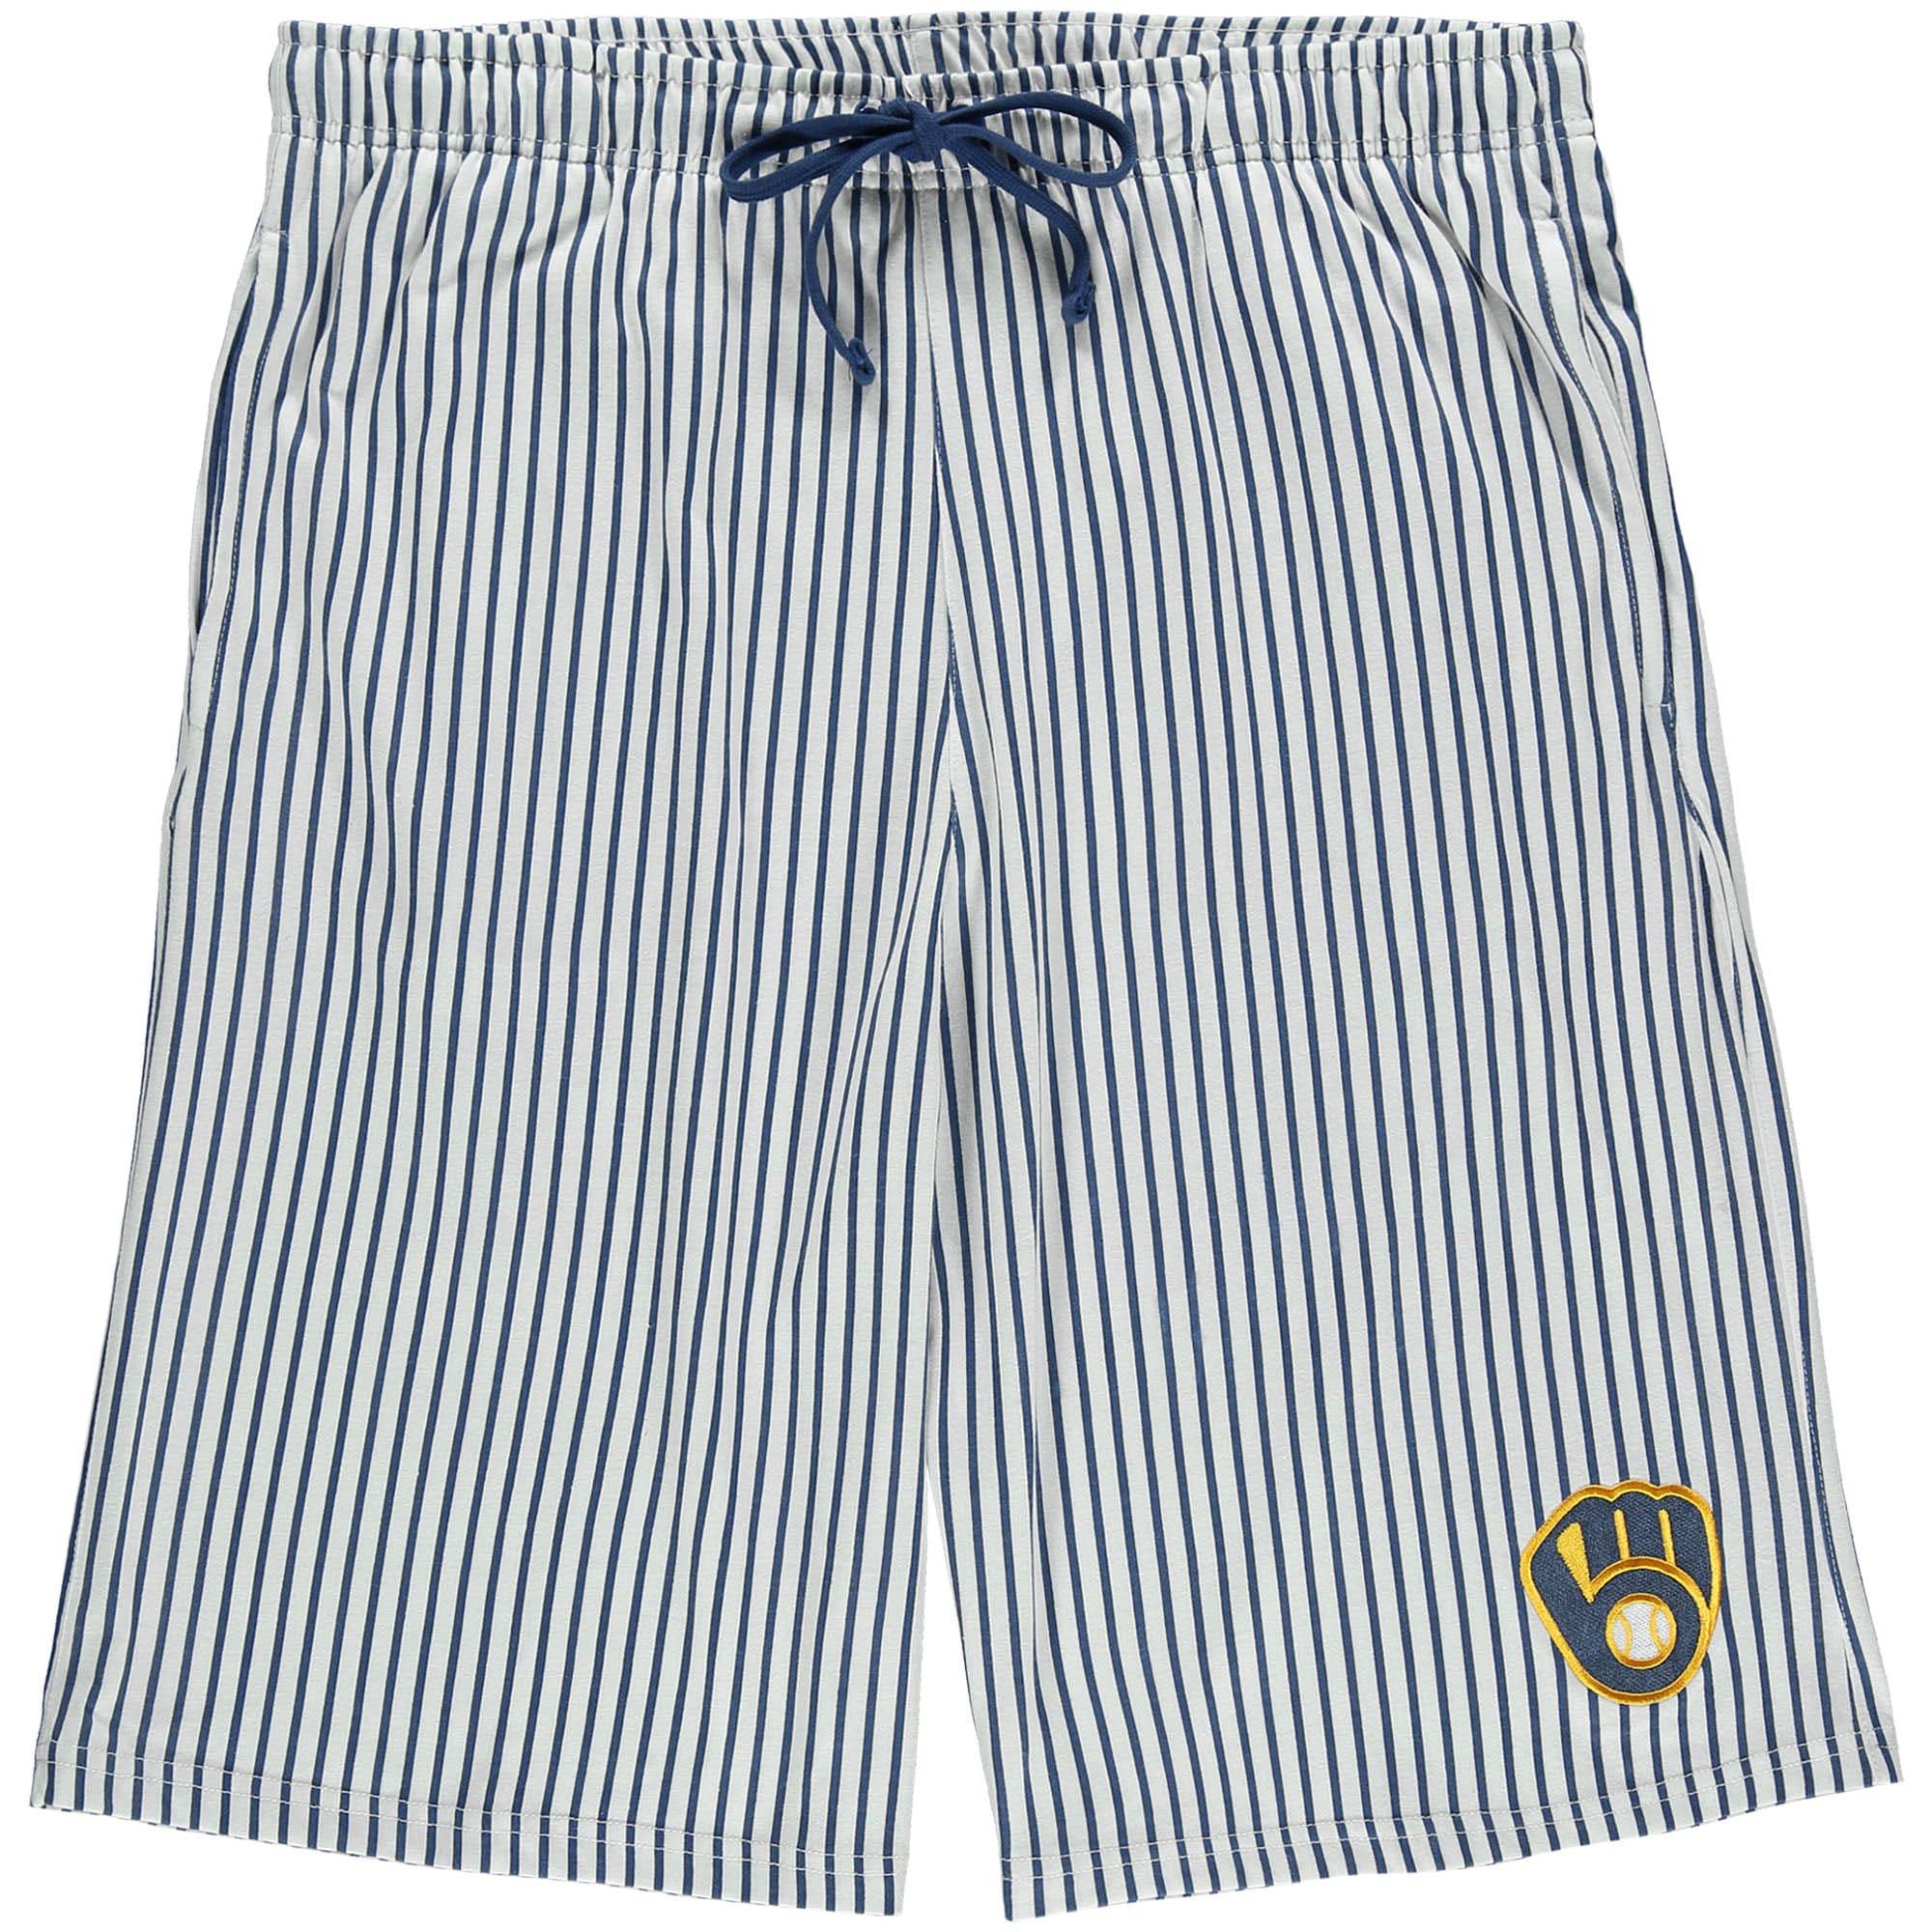 Milwaukee Brewers Big & Tall Pinstripe Shorts - White/Royal